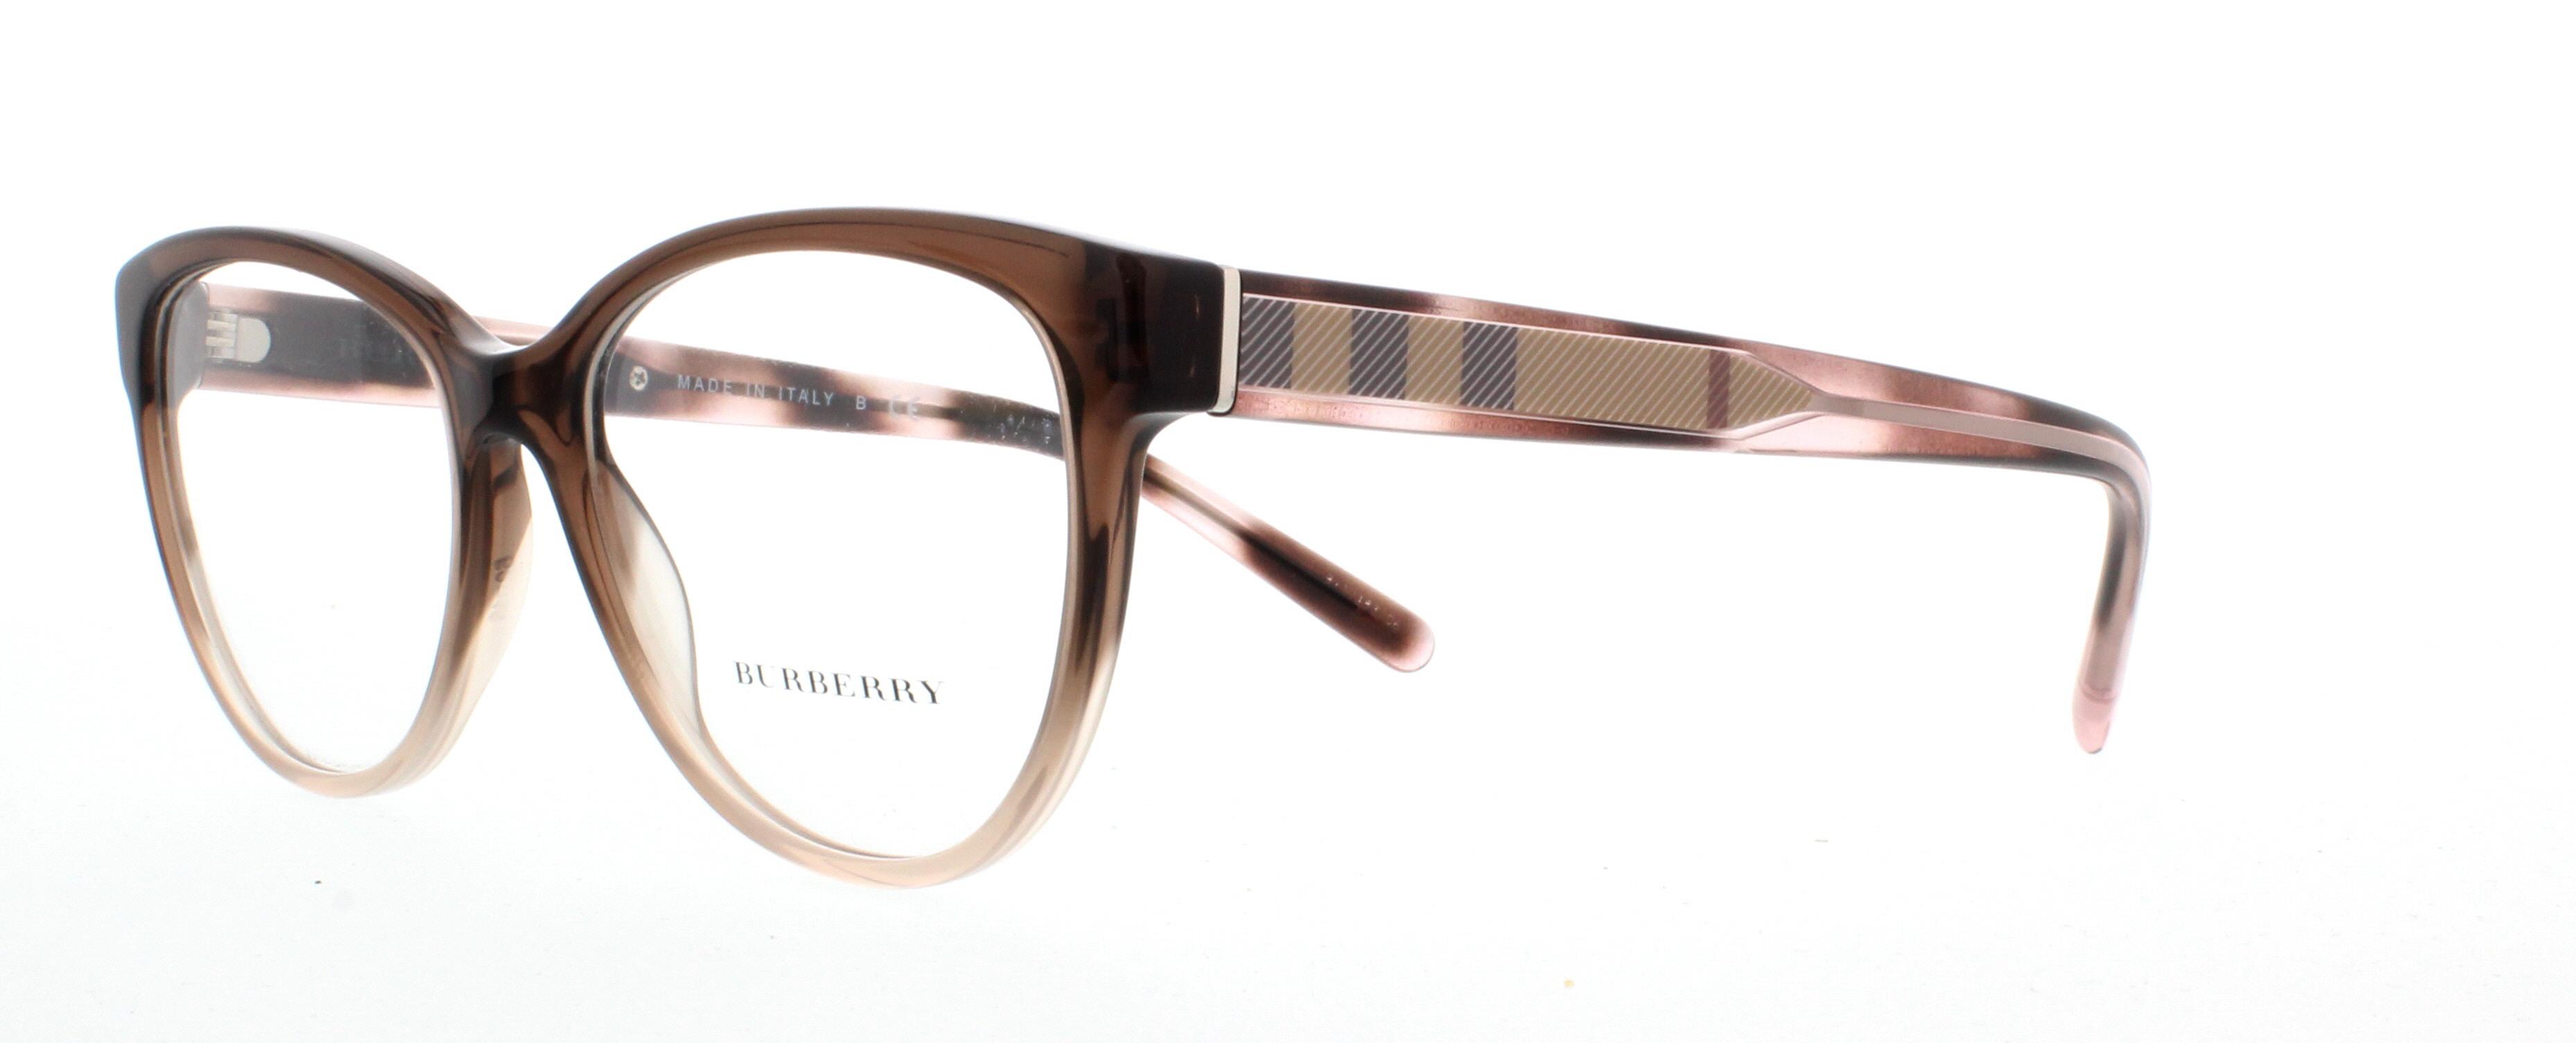 1fc6ae5b02a2 Designer Frames Outlet. Burberry BE2229